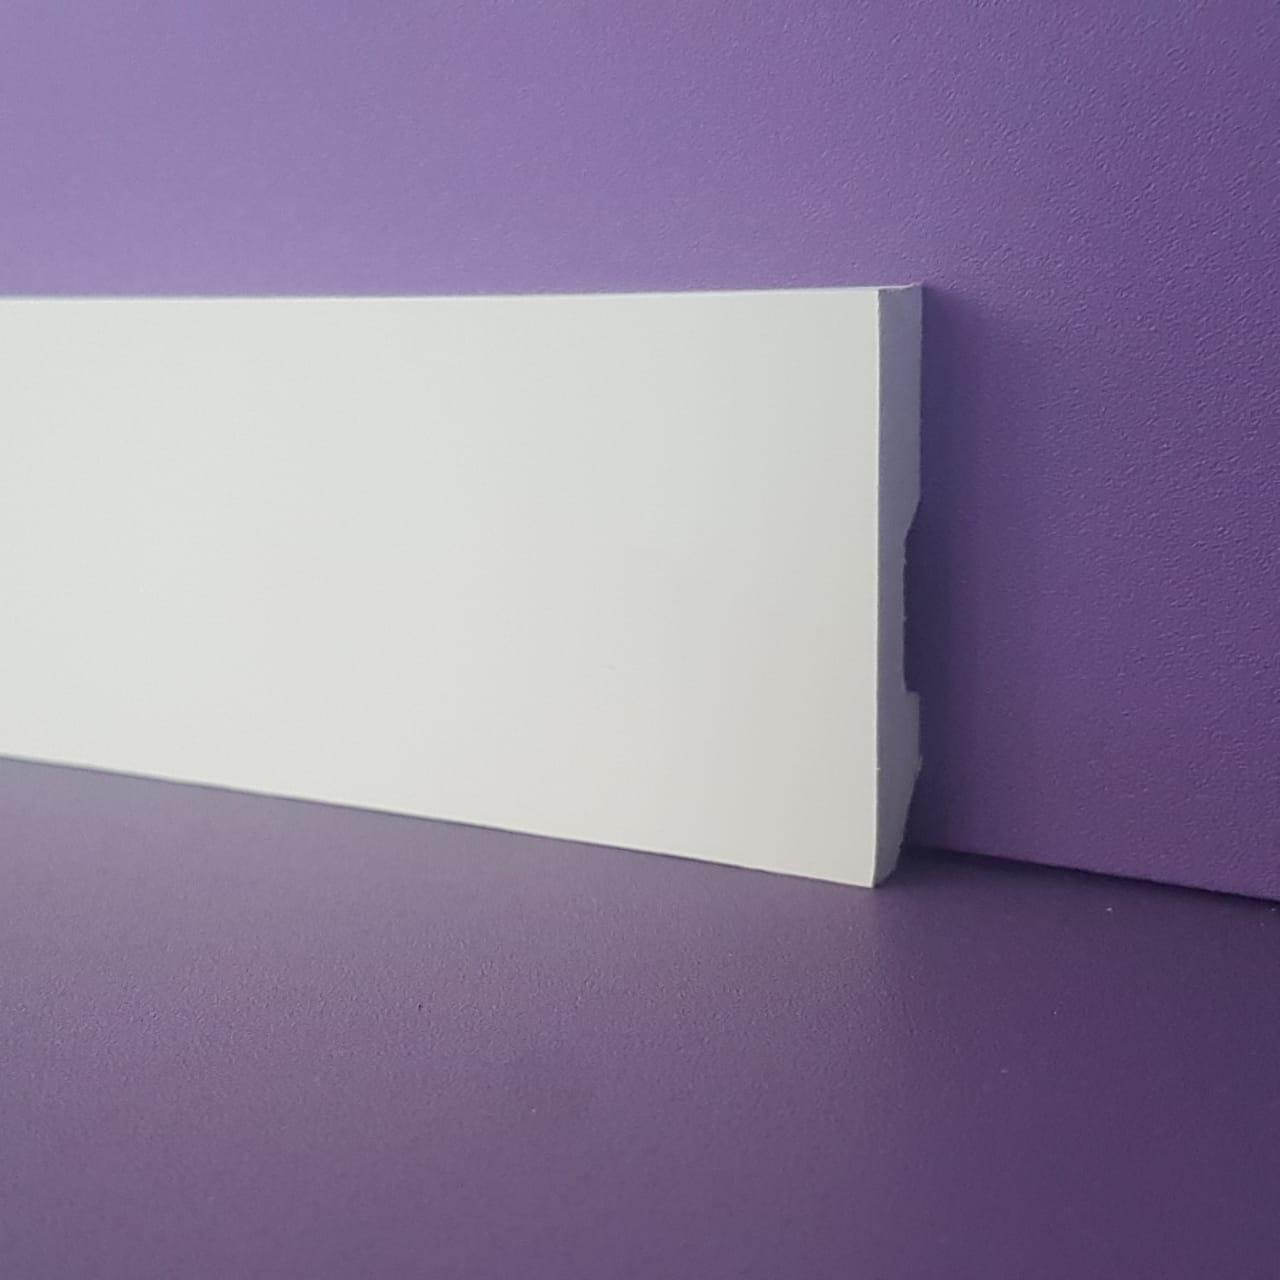 Rodapé de Poliestireno Liso - Branco - 5cm de altura  (5x1x240cm)